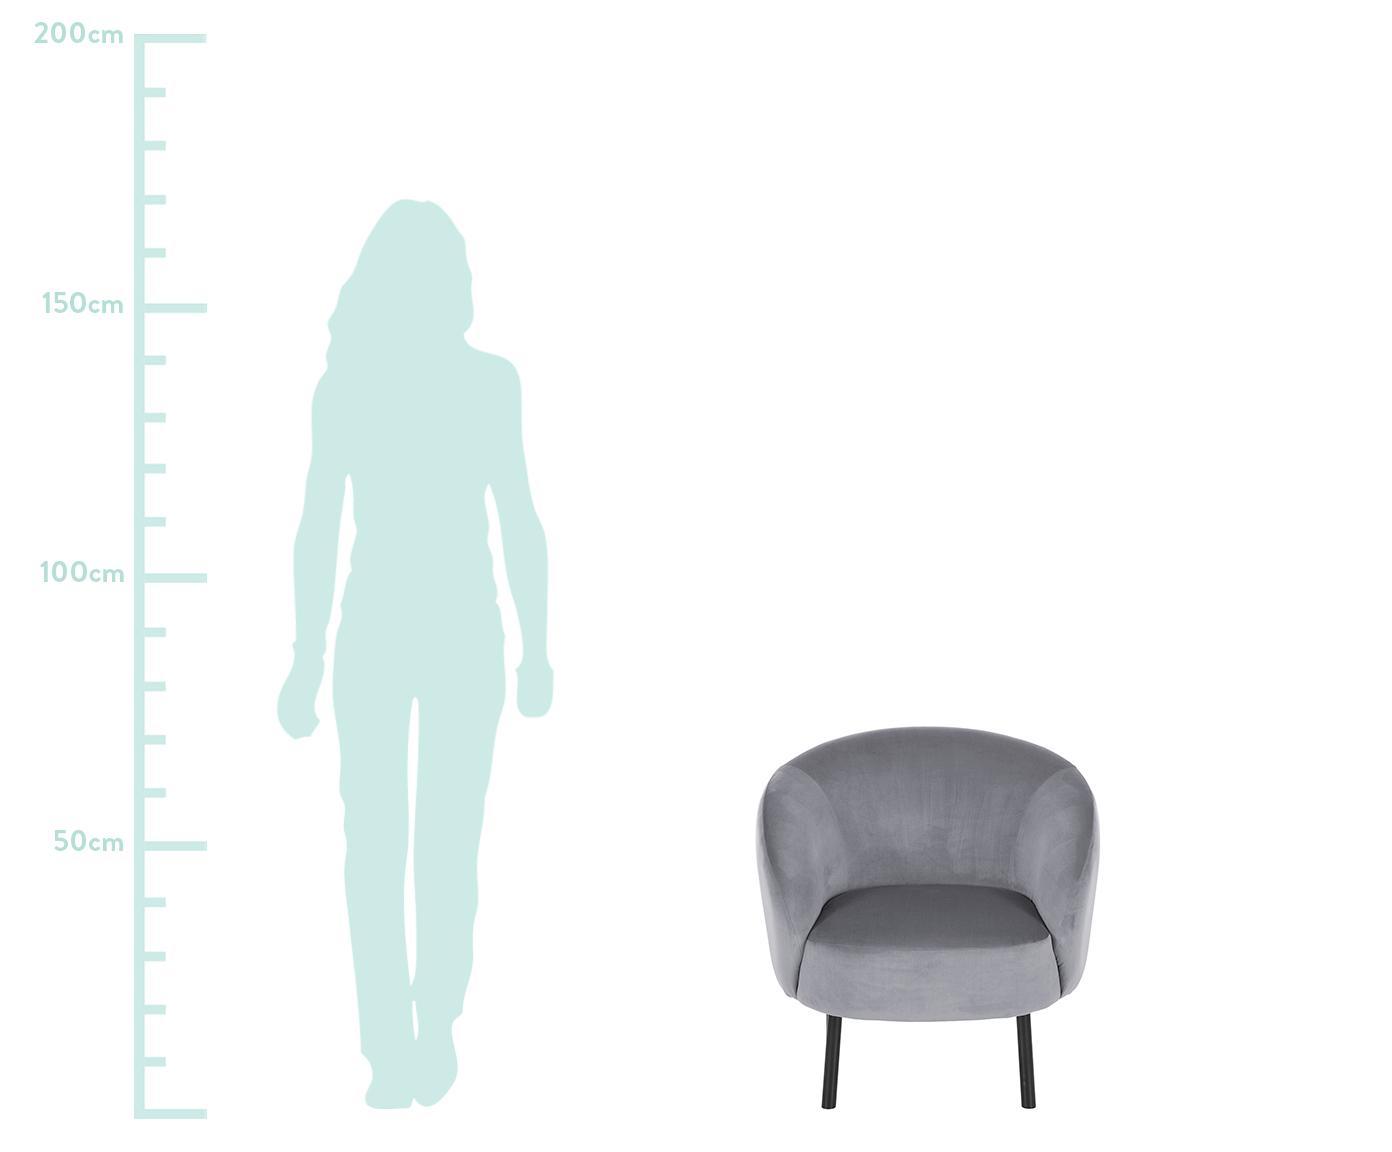 Samt-Cocktailsessel Freja, Bezug: Samt (Polyester) 30.000 S, Füße: Metall, pulverbeschichtet, Samt Grau, B 65 x T 72 cm